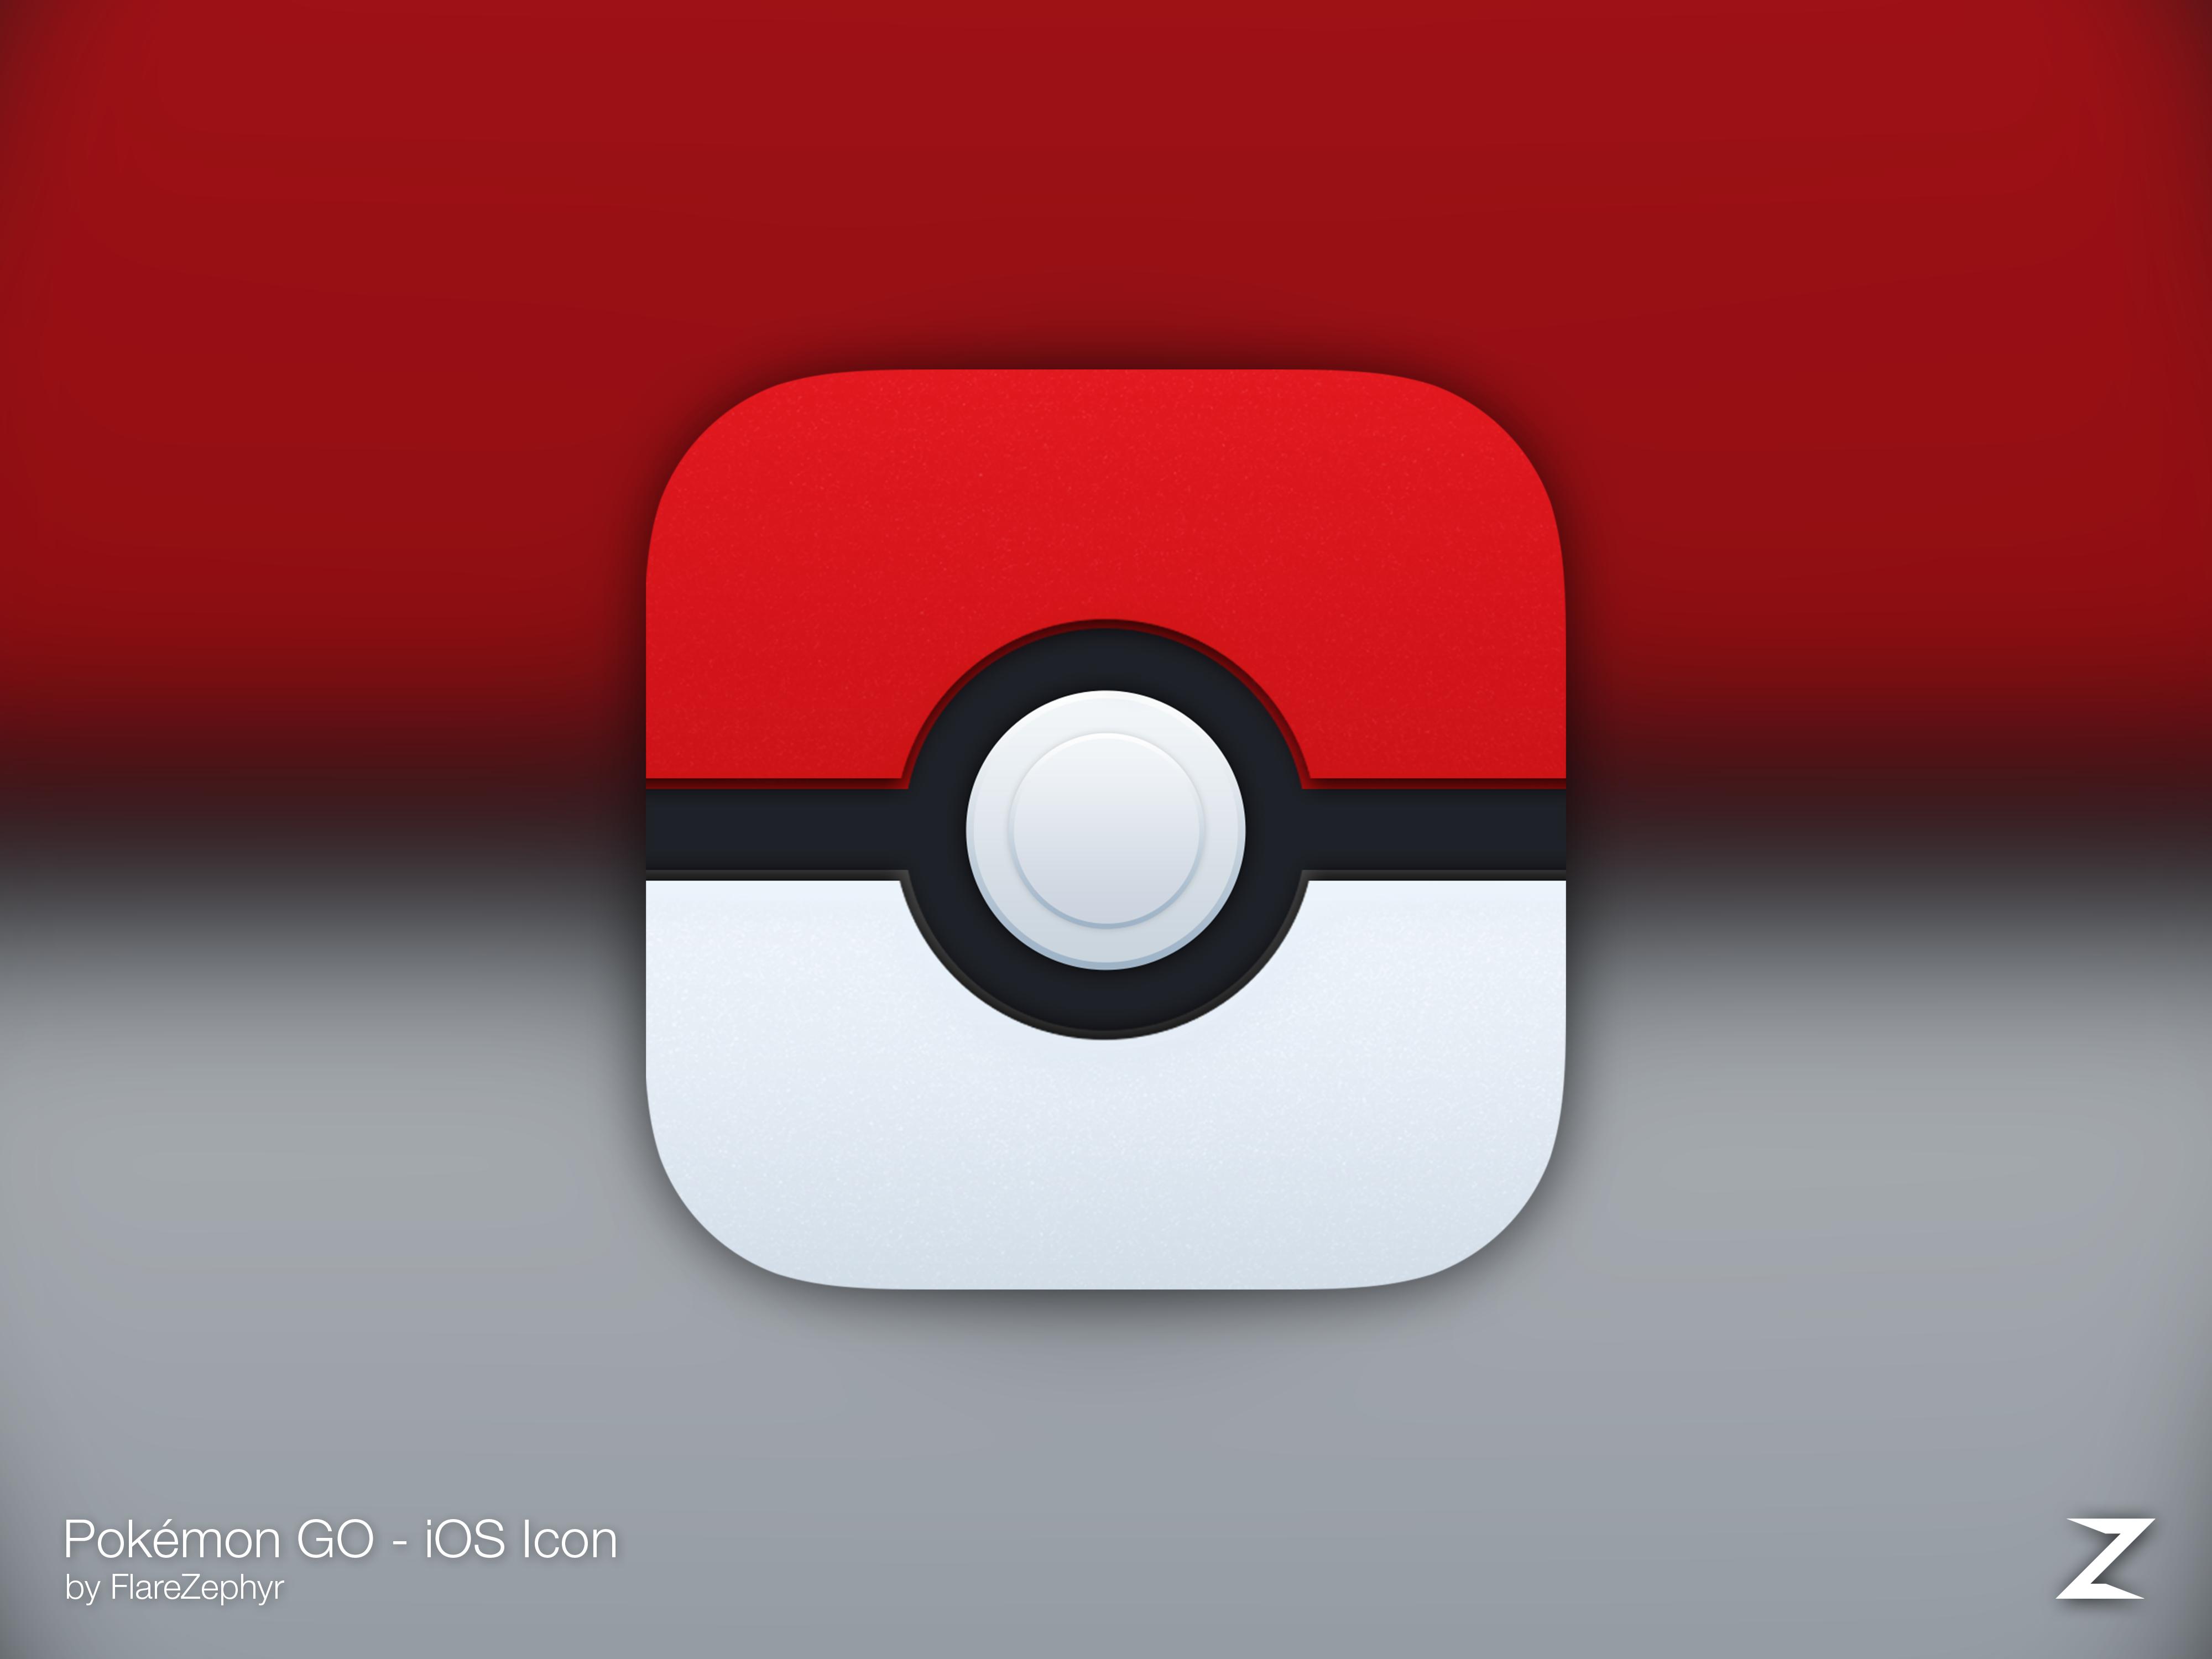 Pokemon GO Redesigned iOS icon